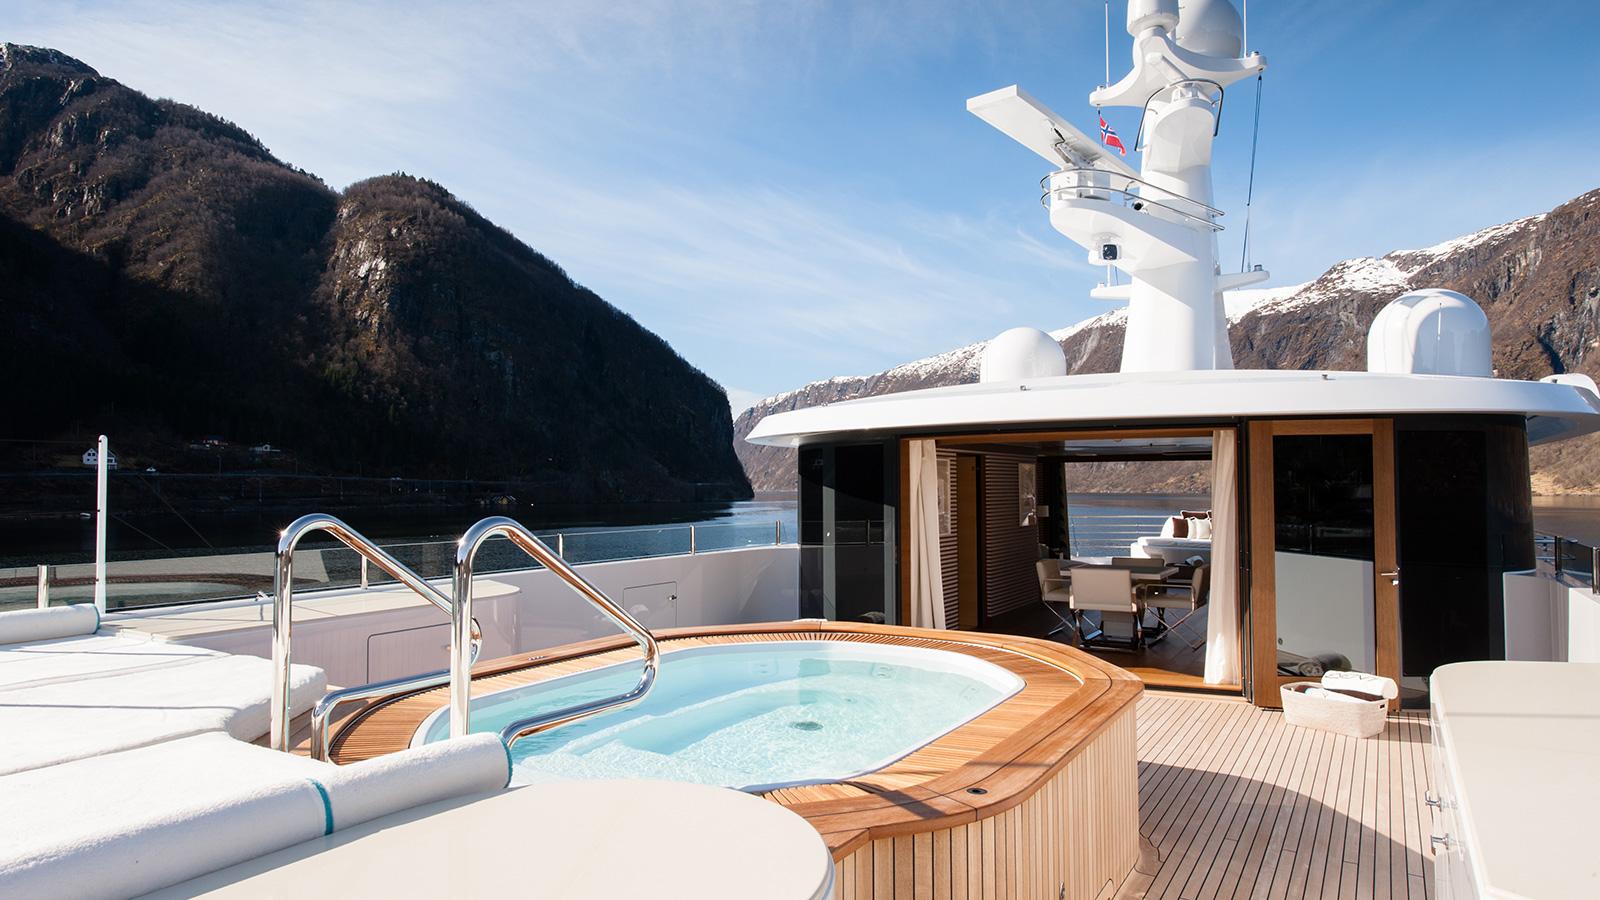 Event Yacht Upper Deck Spa Tub